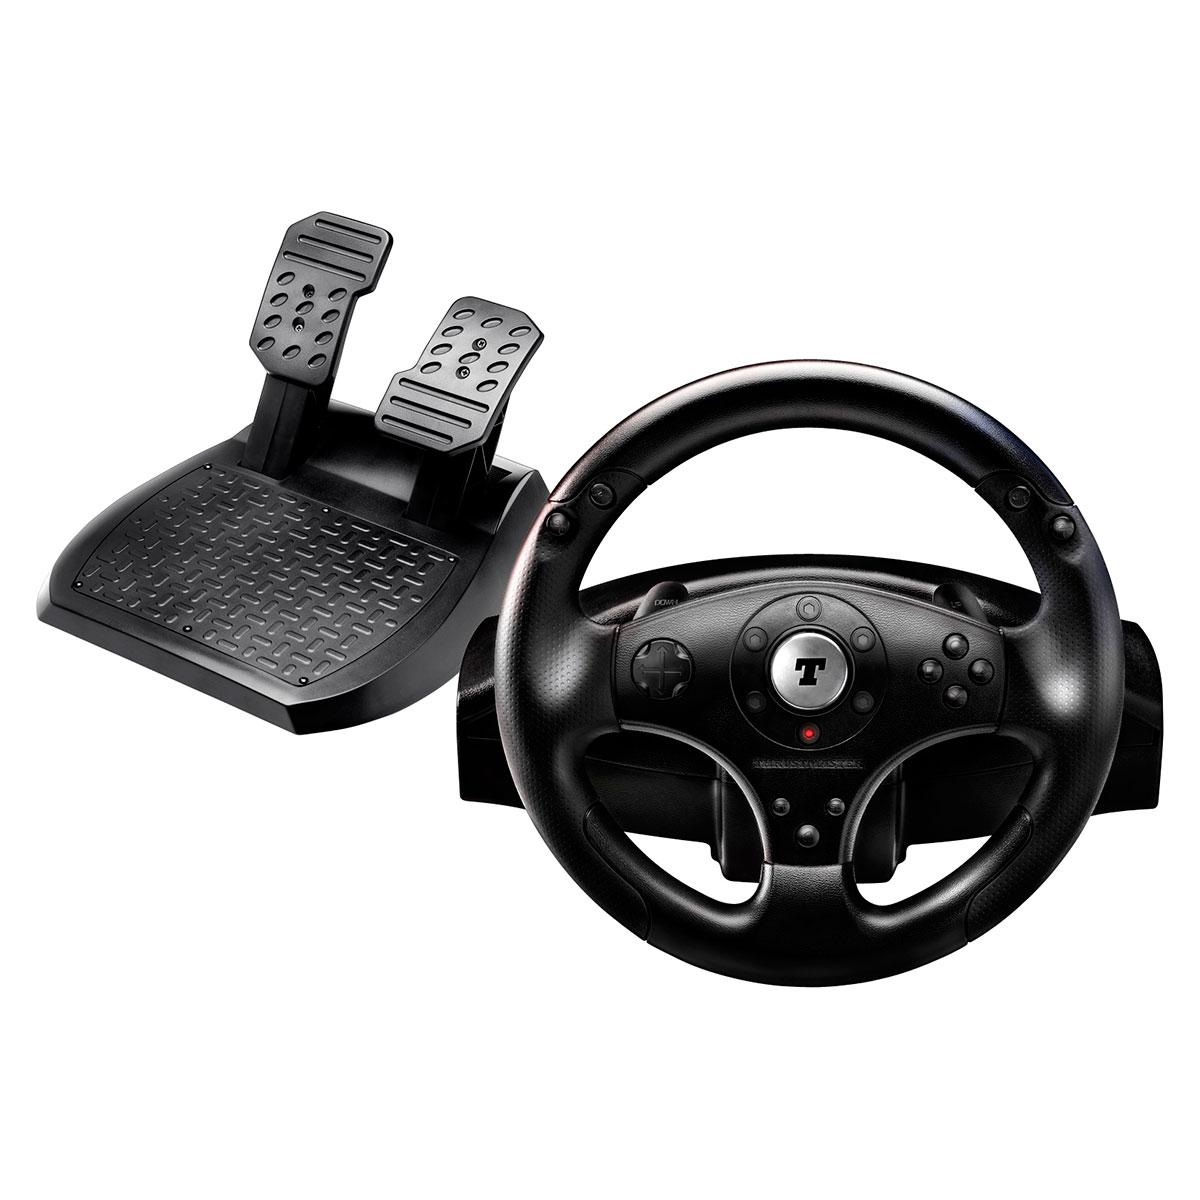 thrustmaster t100 force feedback racing wheel volant pc thrustmaster sur. Black Bedroom Furniture Sets. Home Design Ideas